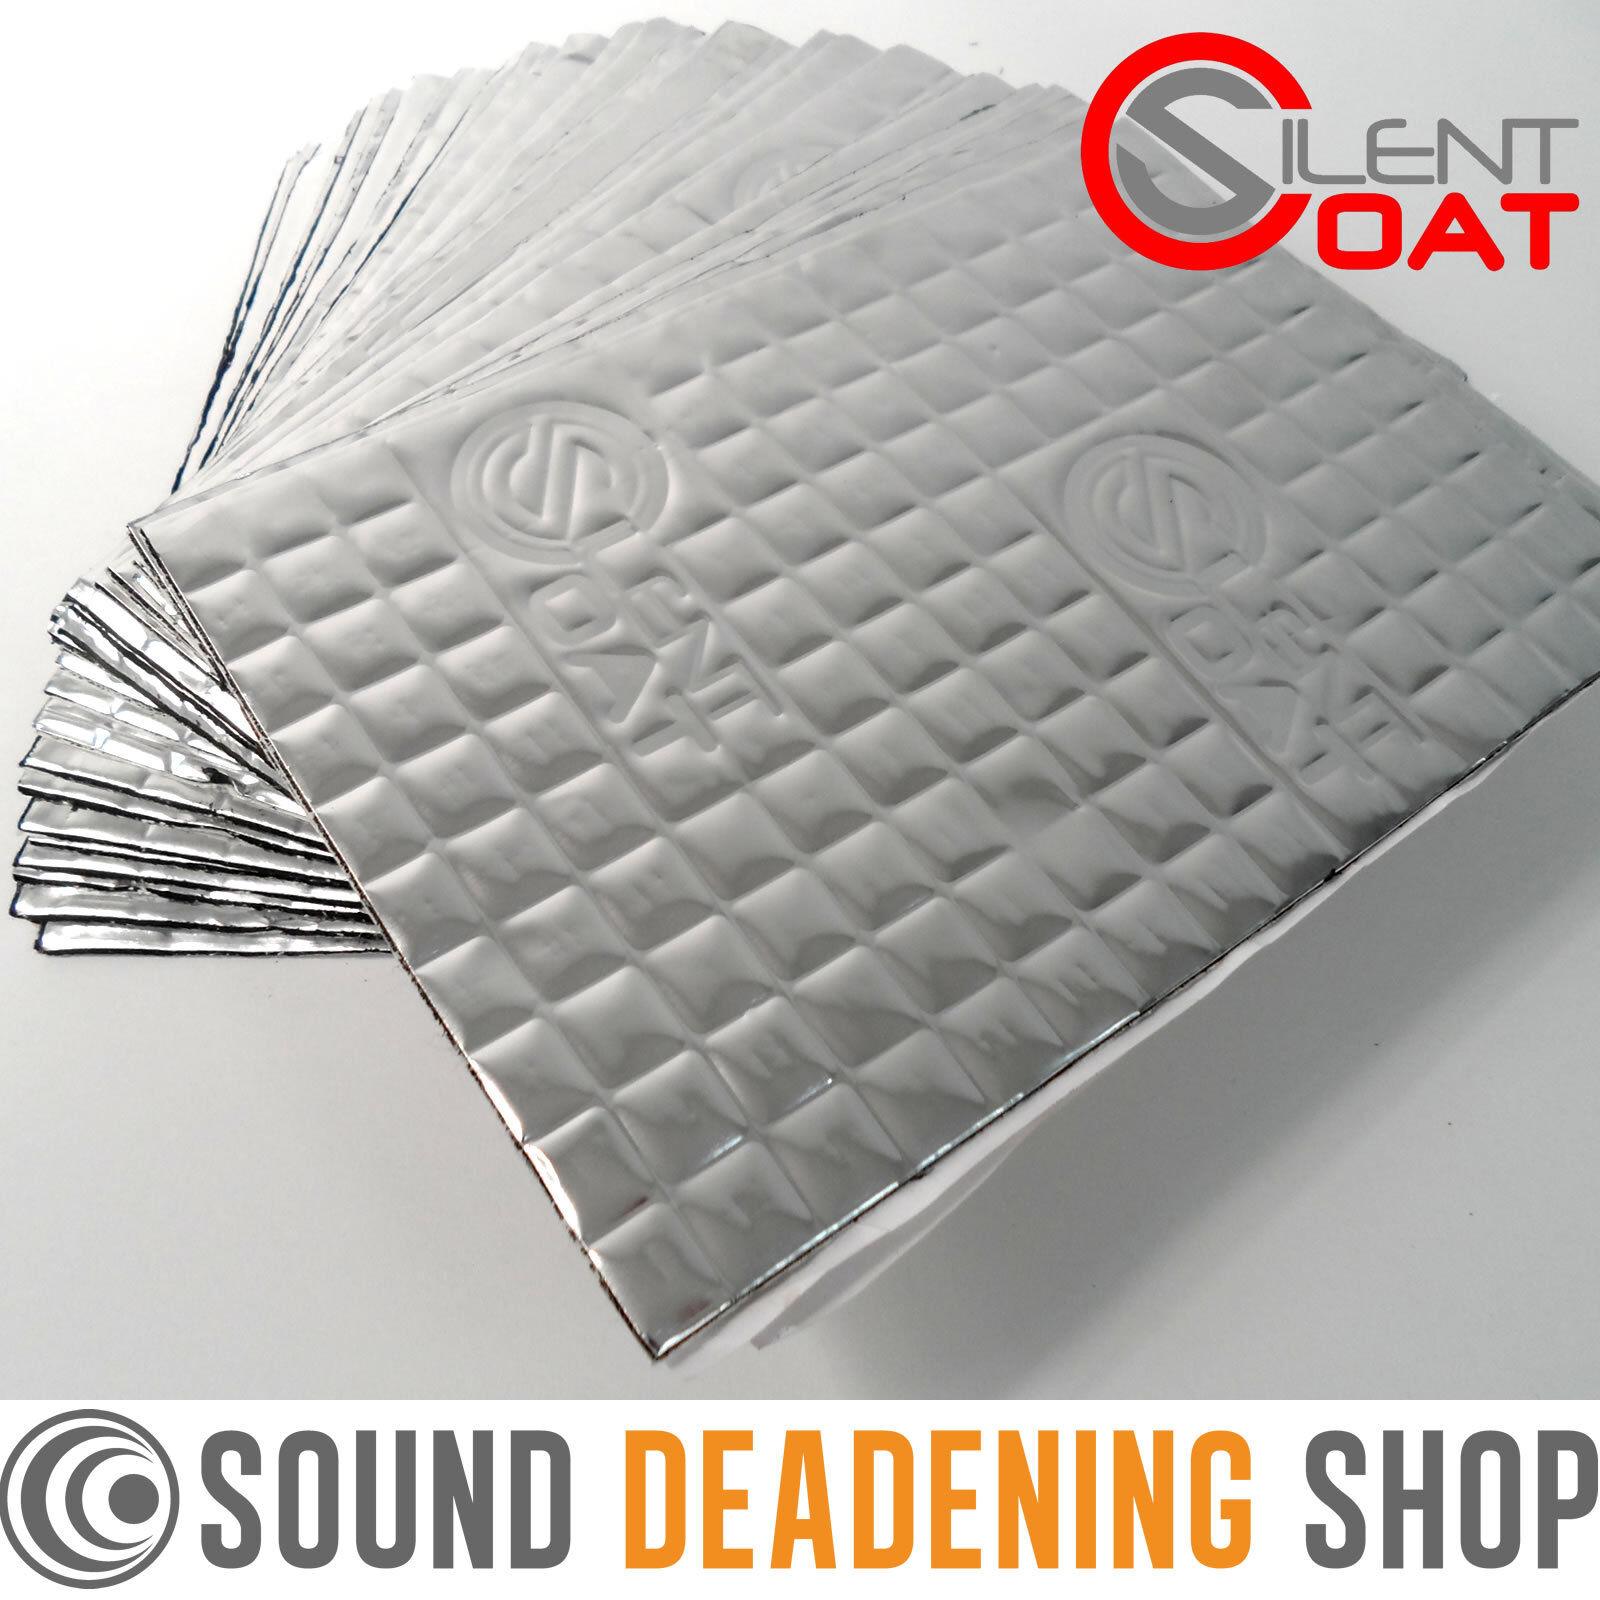 Silent Coat 2mm 30 Sheets Pack Car Van Deadening Sound